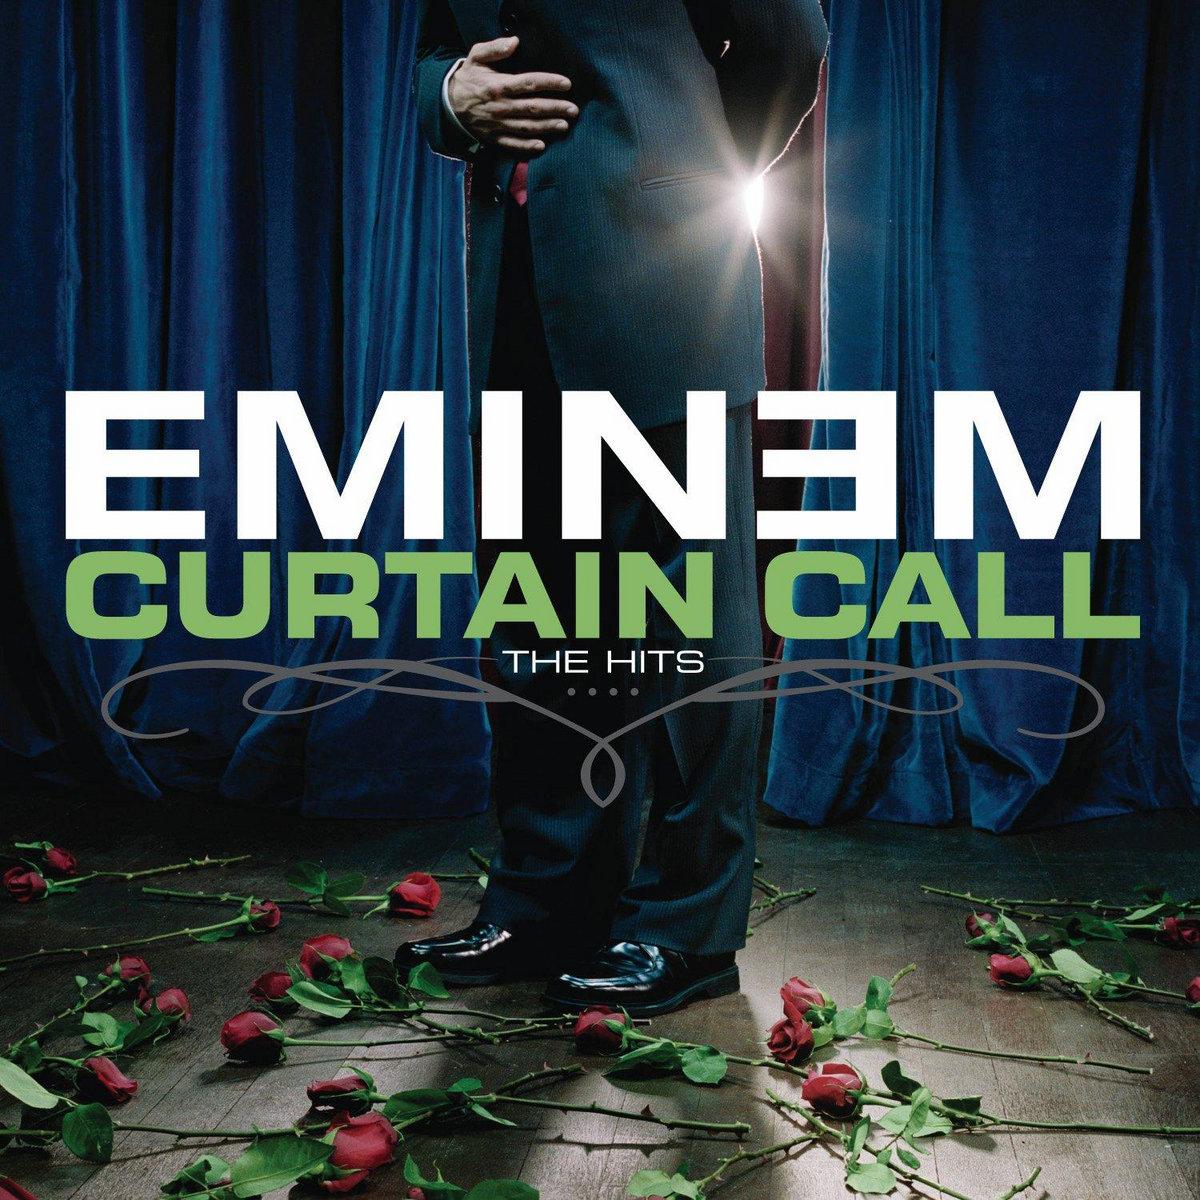 Curtain call eminem - Curtain Call By Eminem